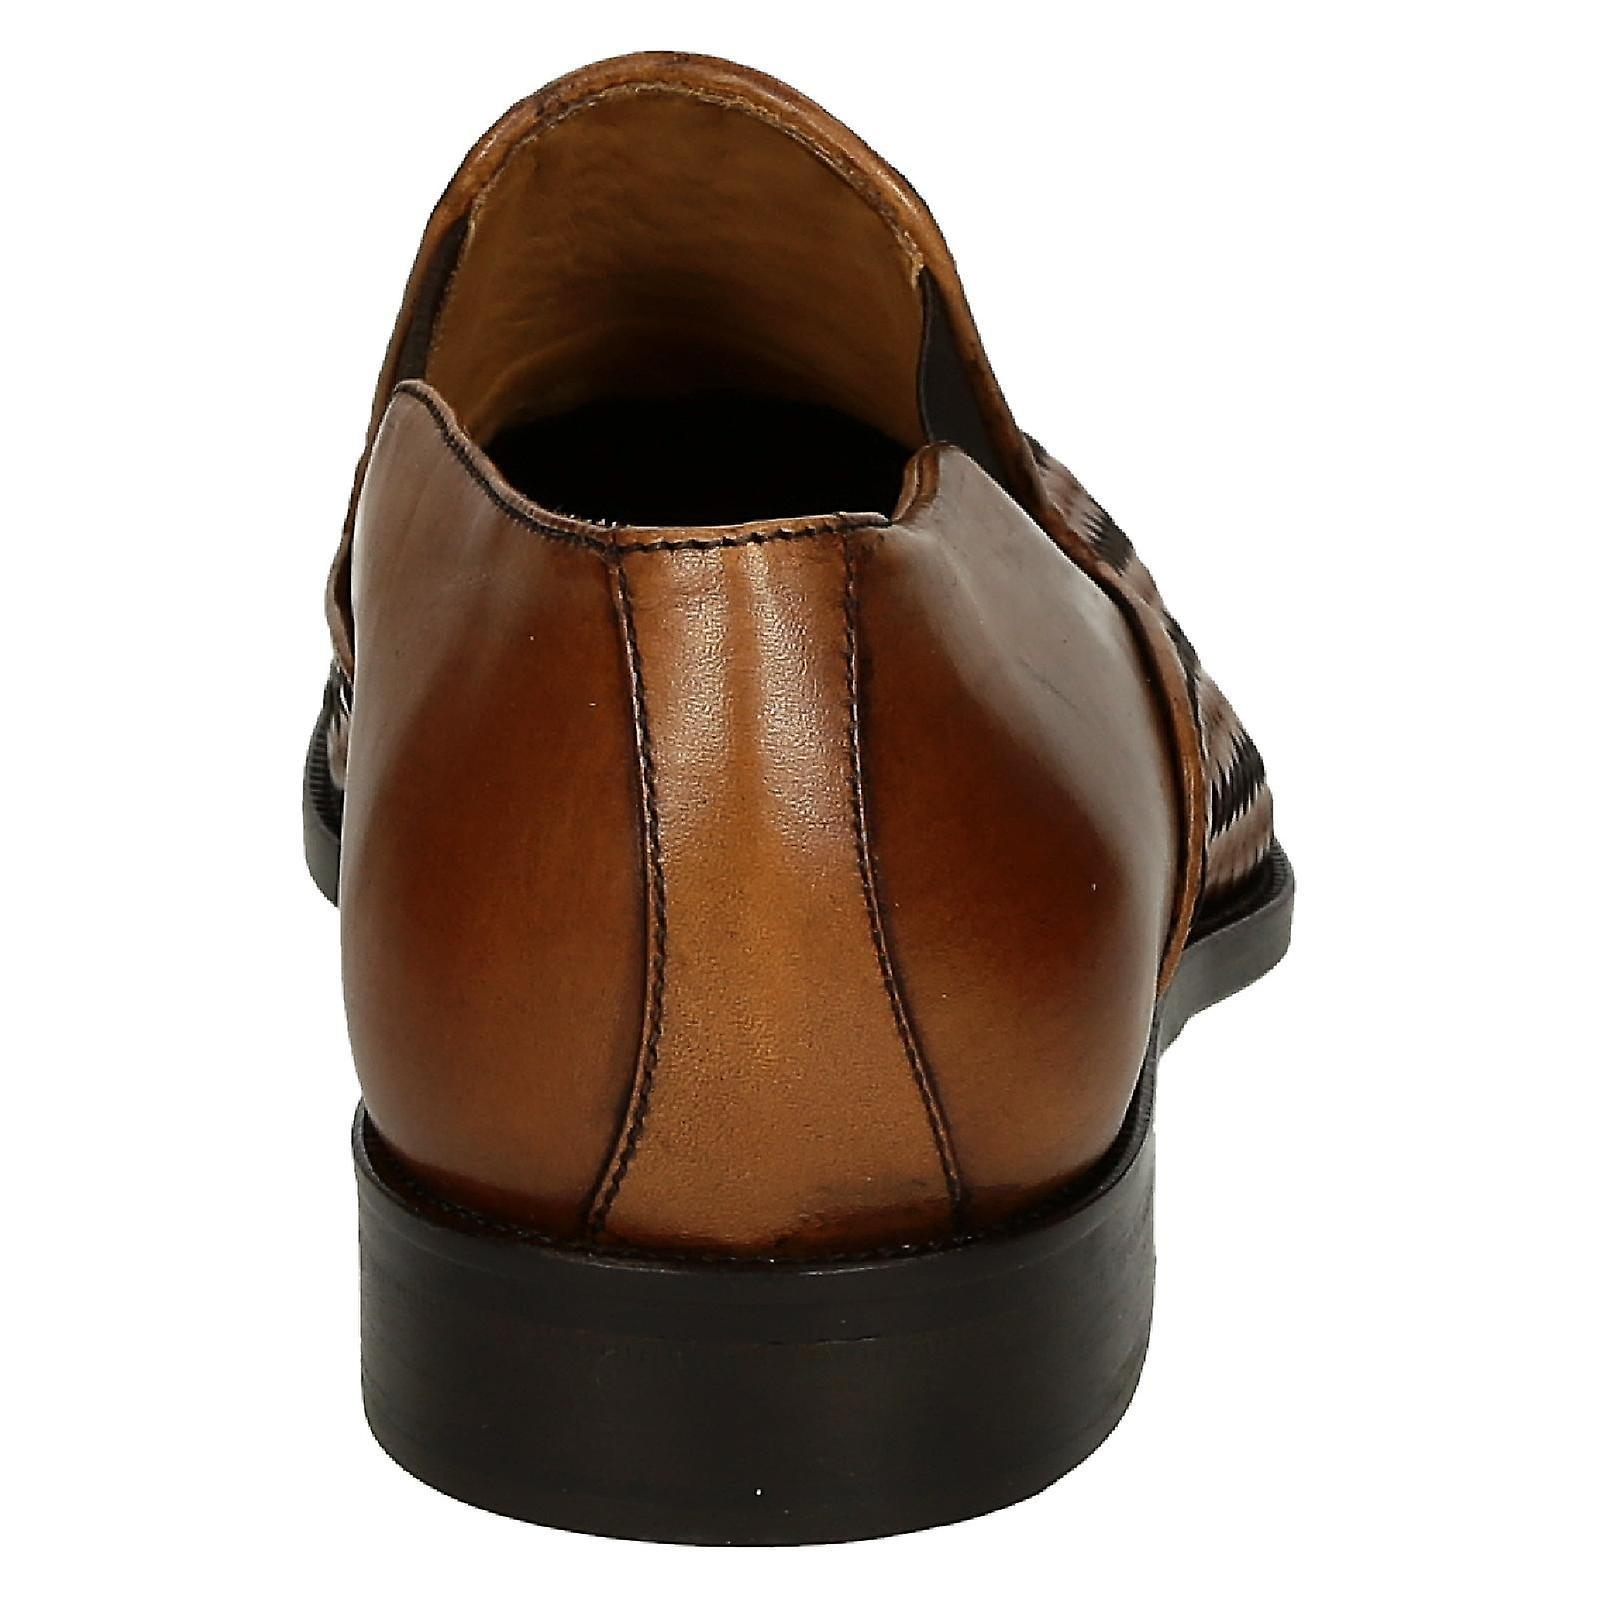 Handmade tan woven leather men's men's men's gussets loafers shoes edb251